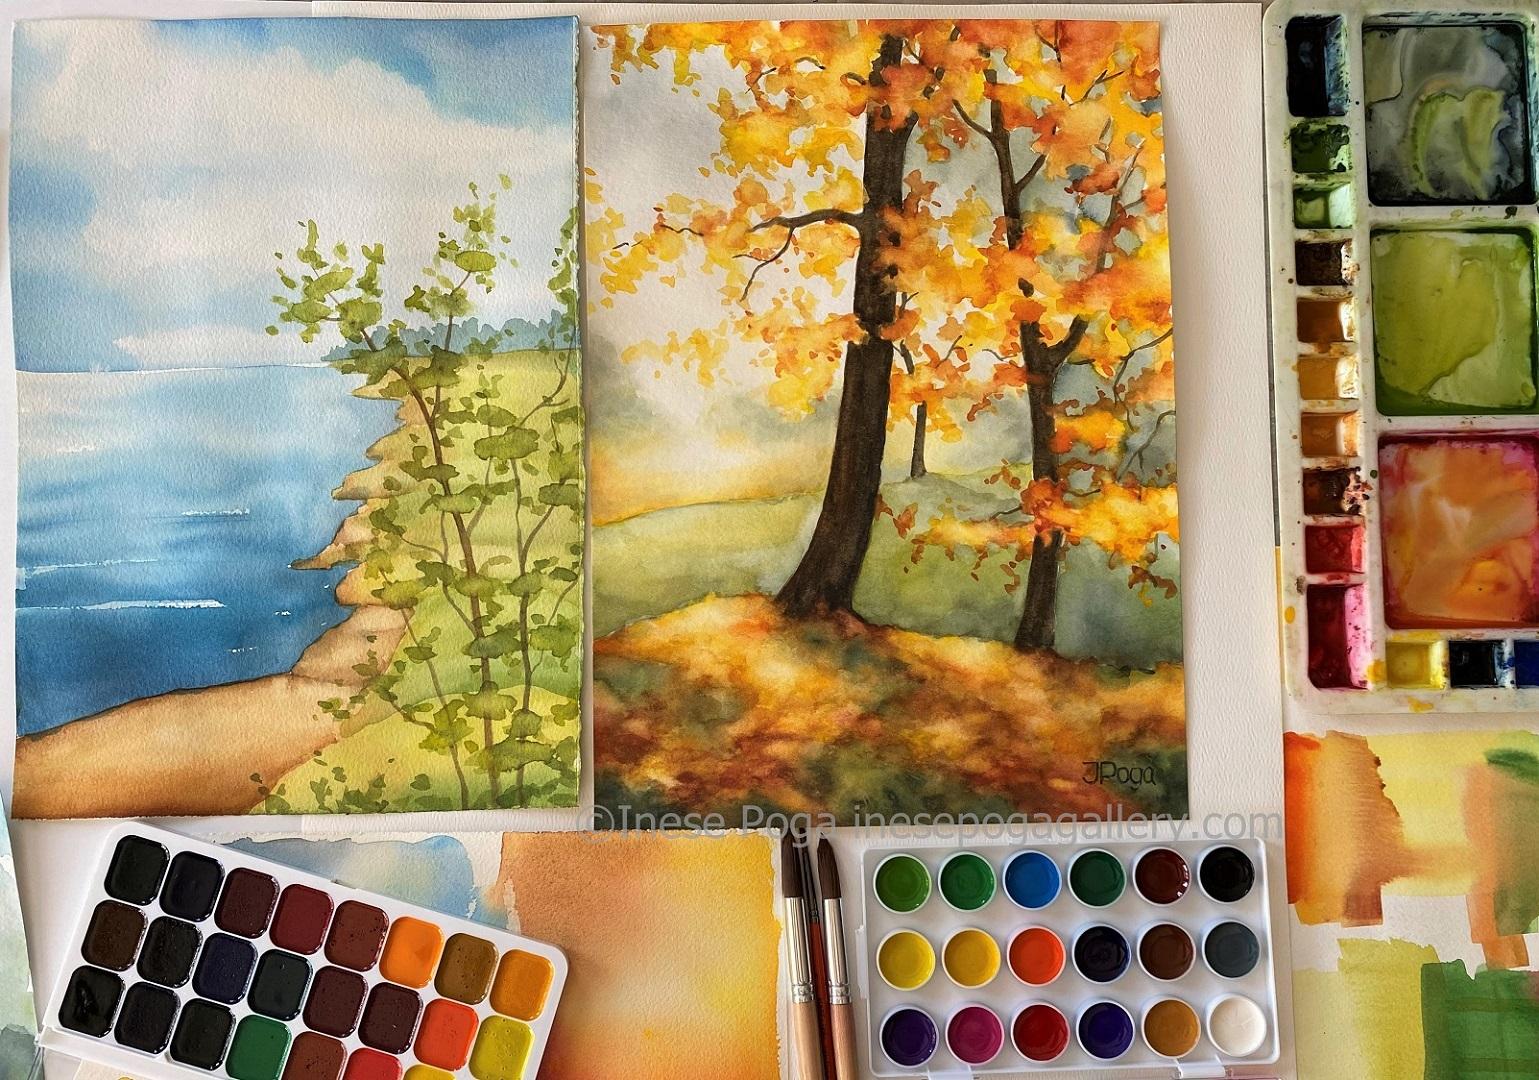 Enjoyable watercolor painting ideas